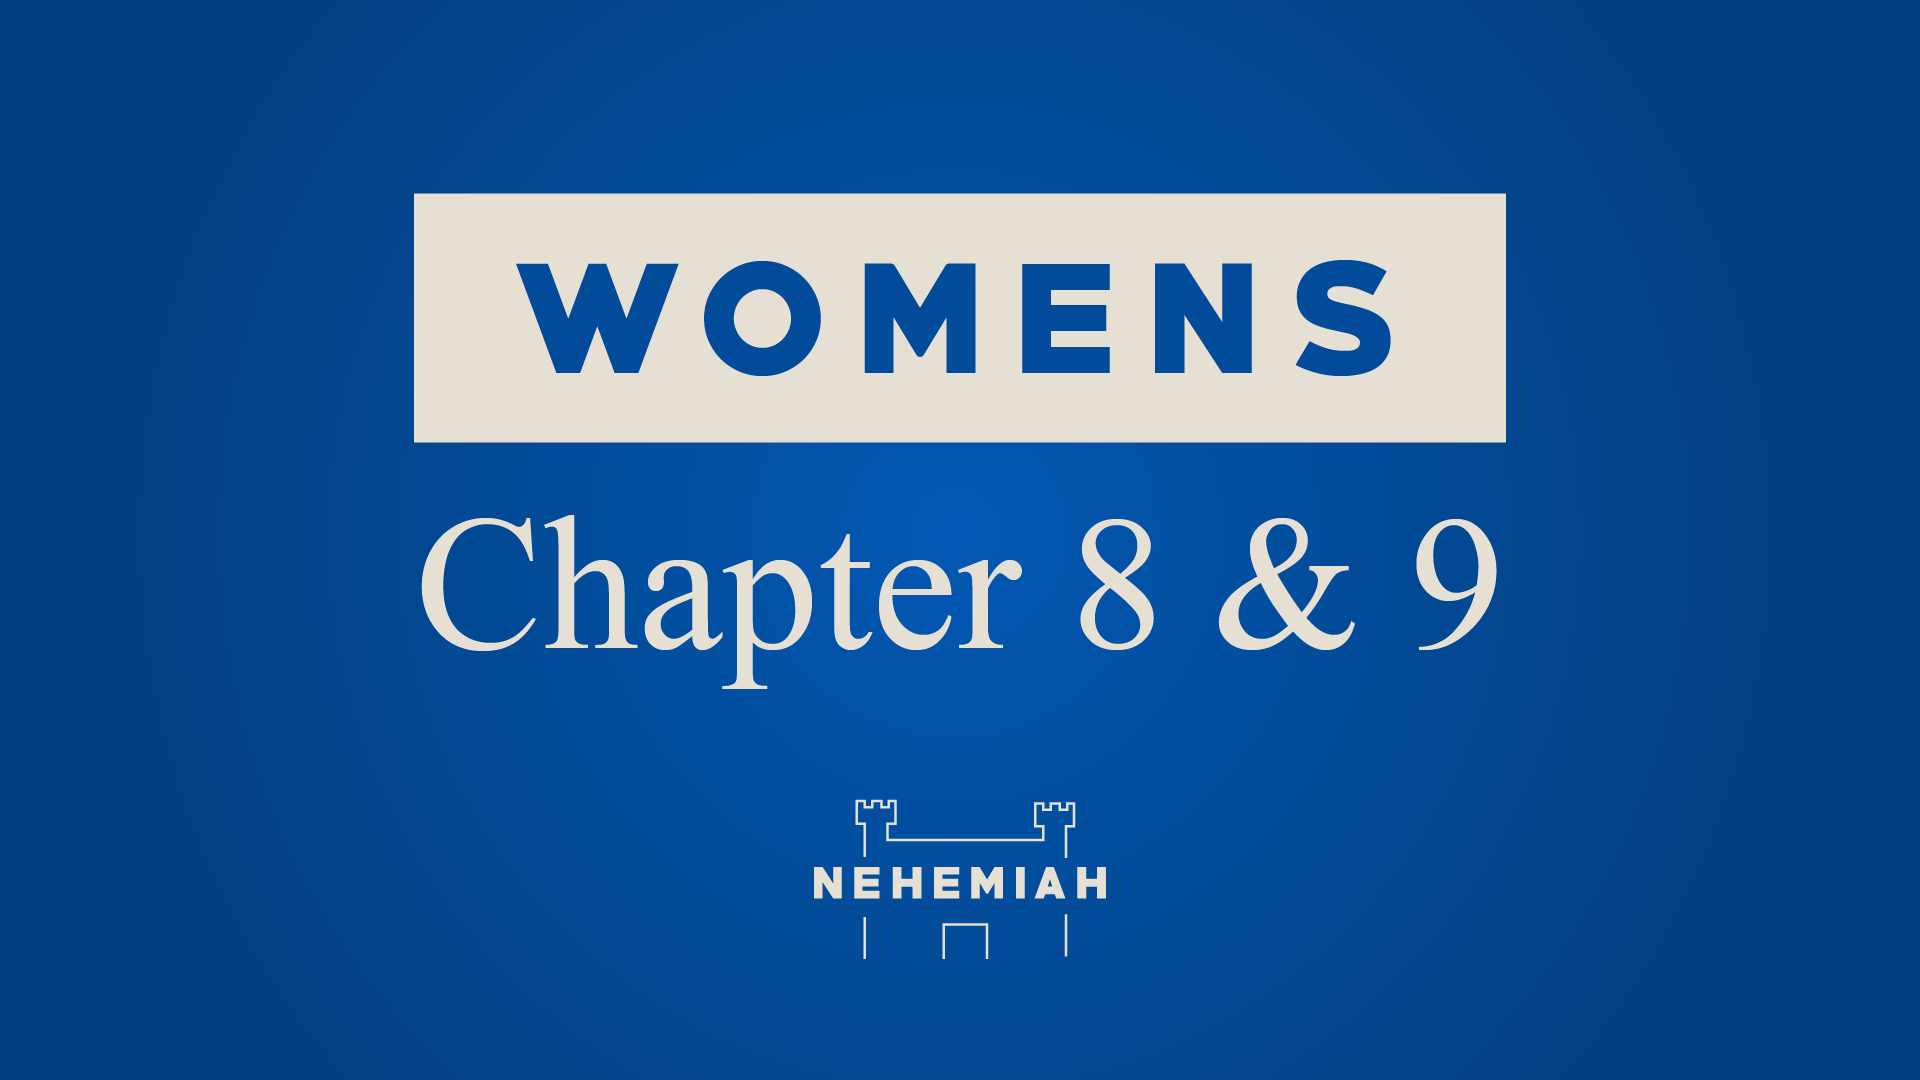 Nehemiah-BS_Women-8-9.png